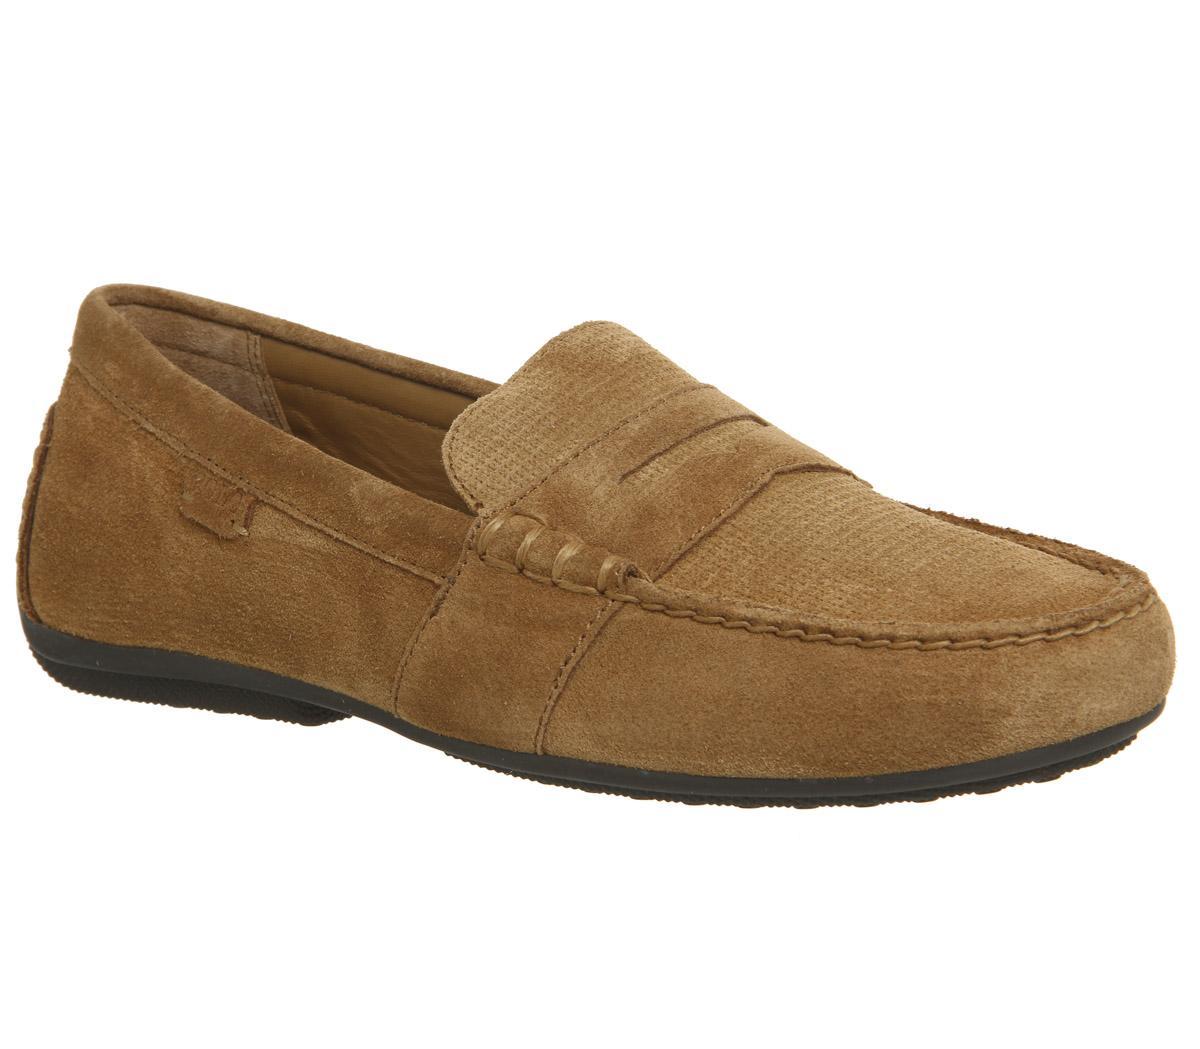 Reynold Loafers